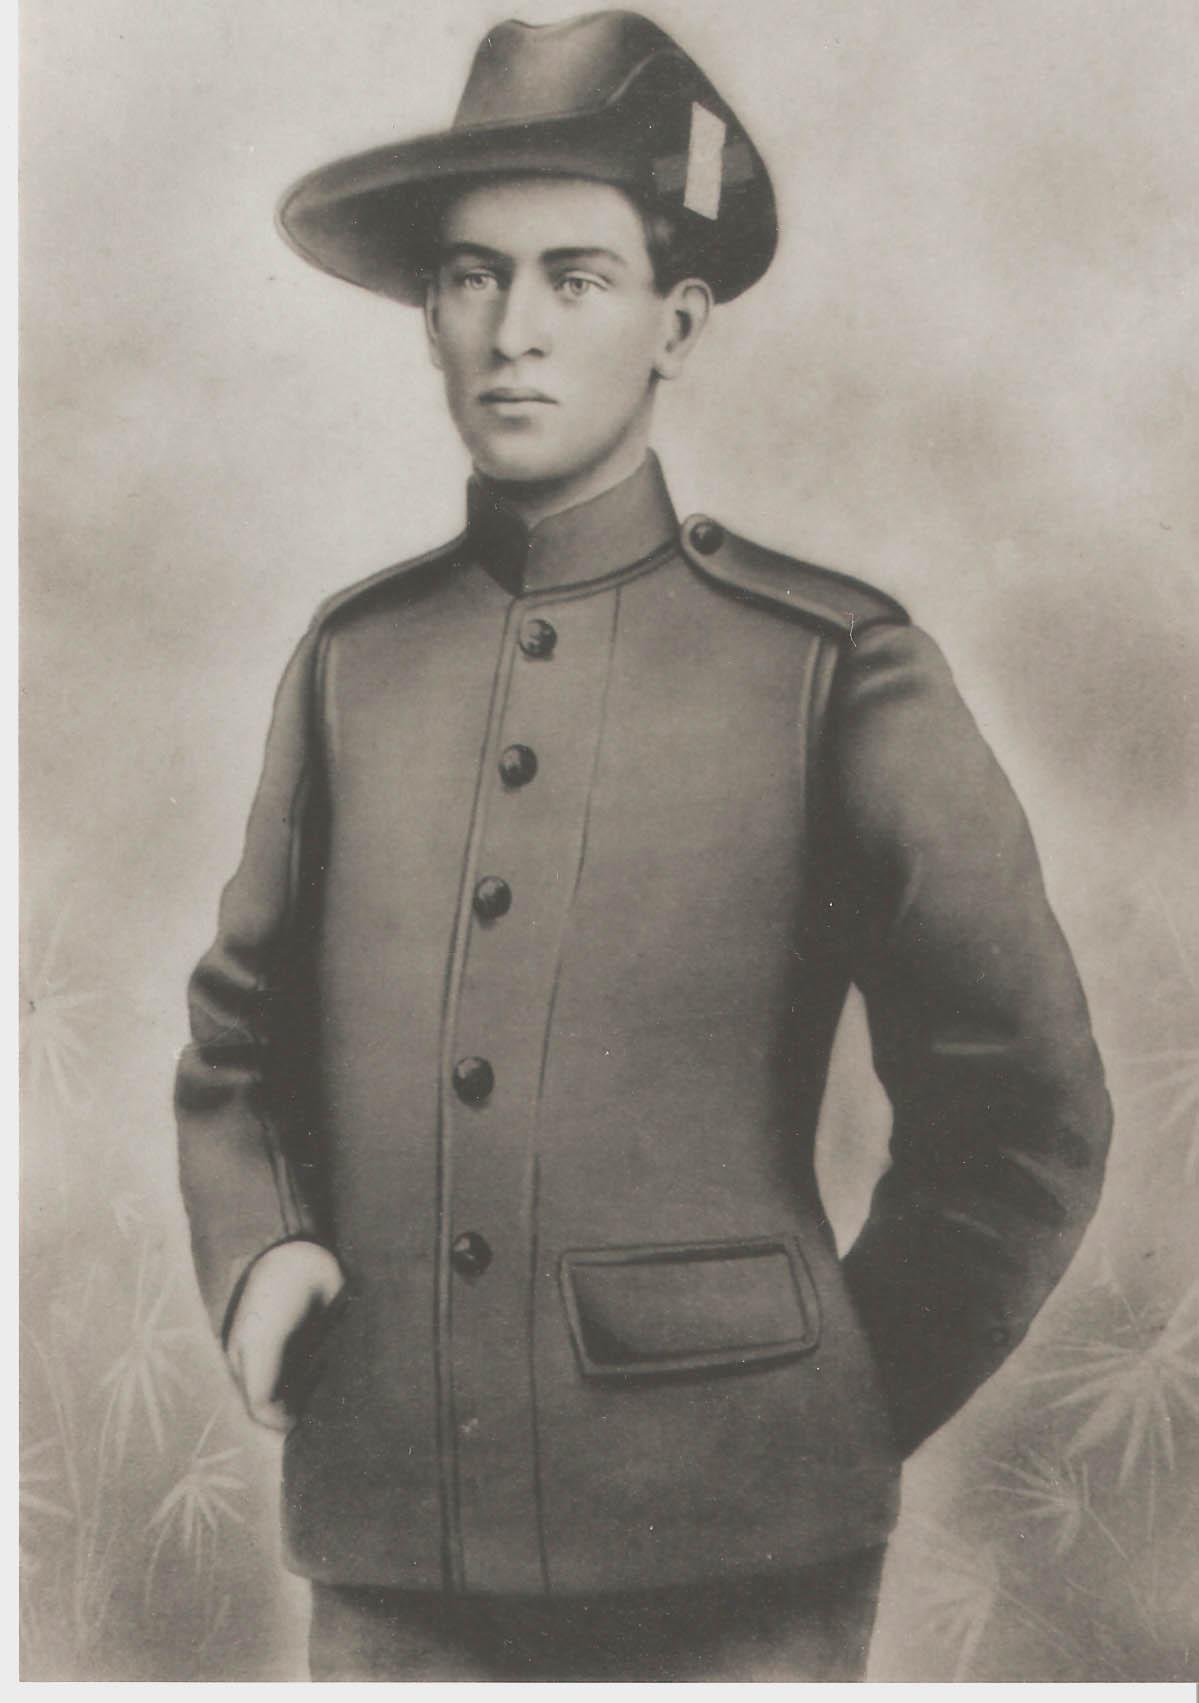 Canadian Fallen Soldier - Corporal EDWARD ALLEN FILSON